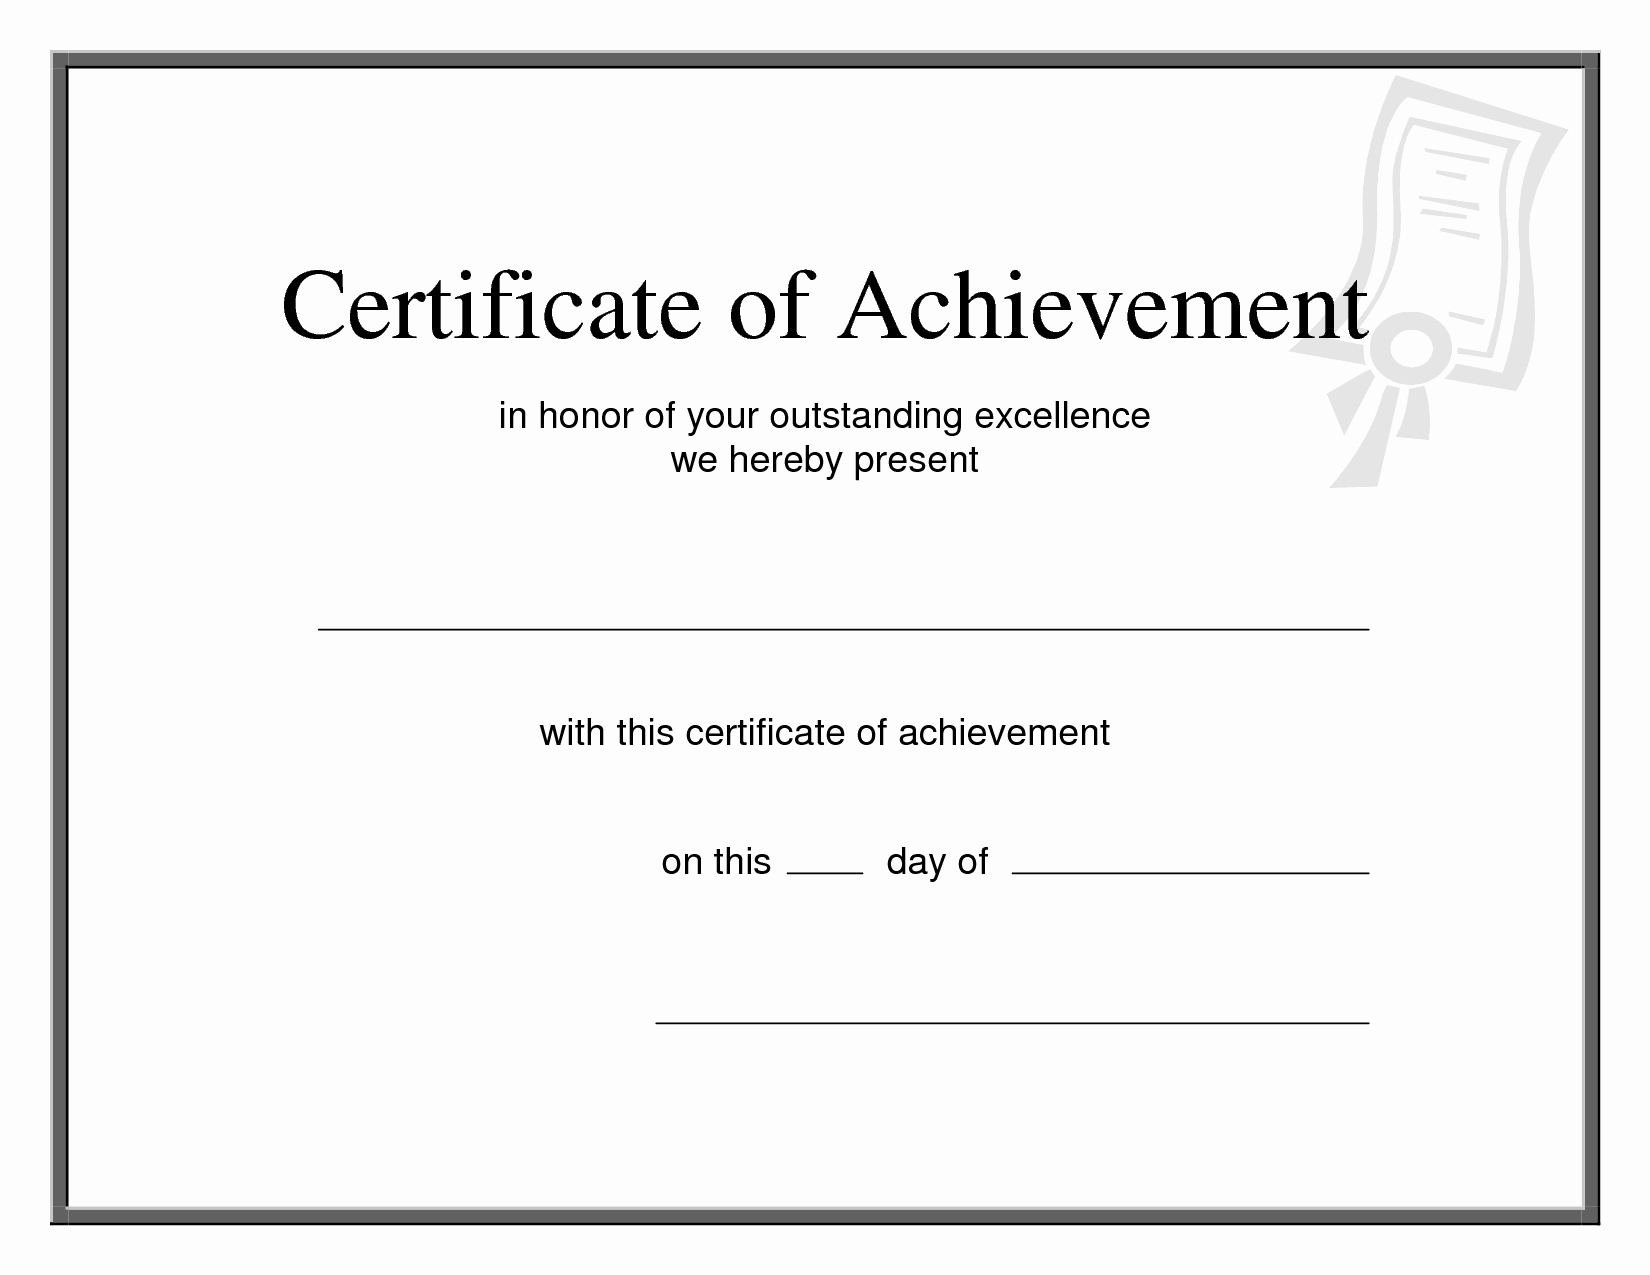 Blank Certificate Of Achievement Template Elegant Army Certificate Achievement Template Example Mughals